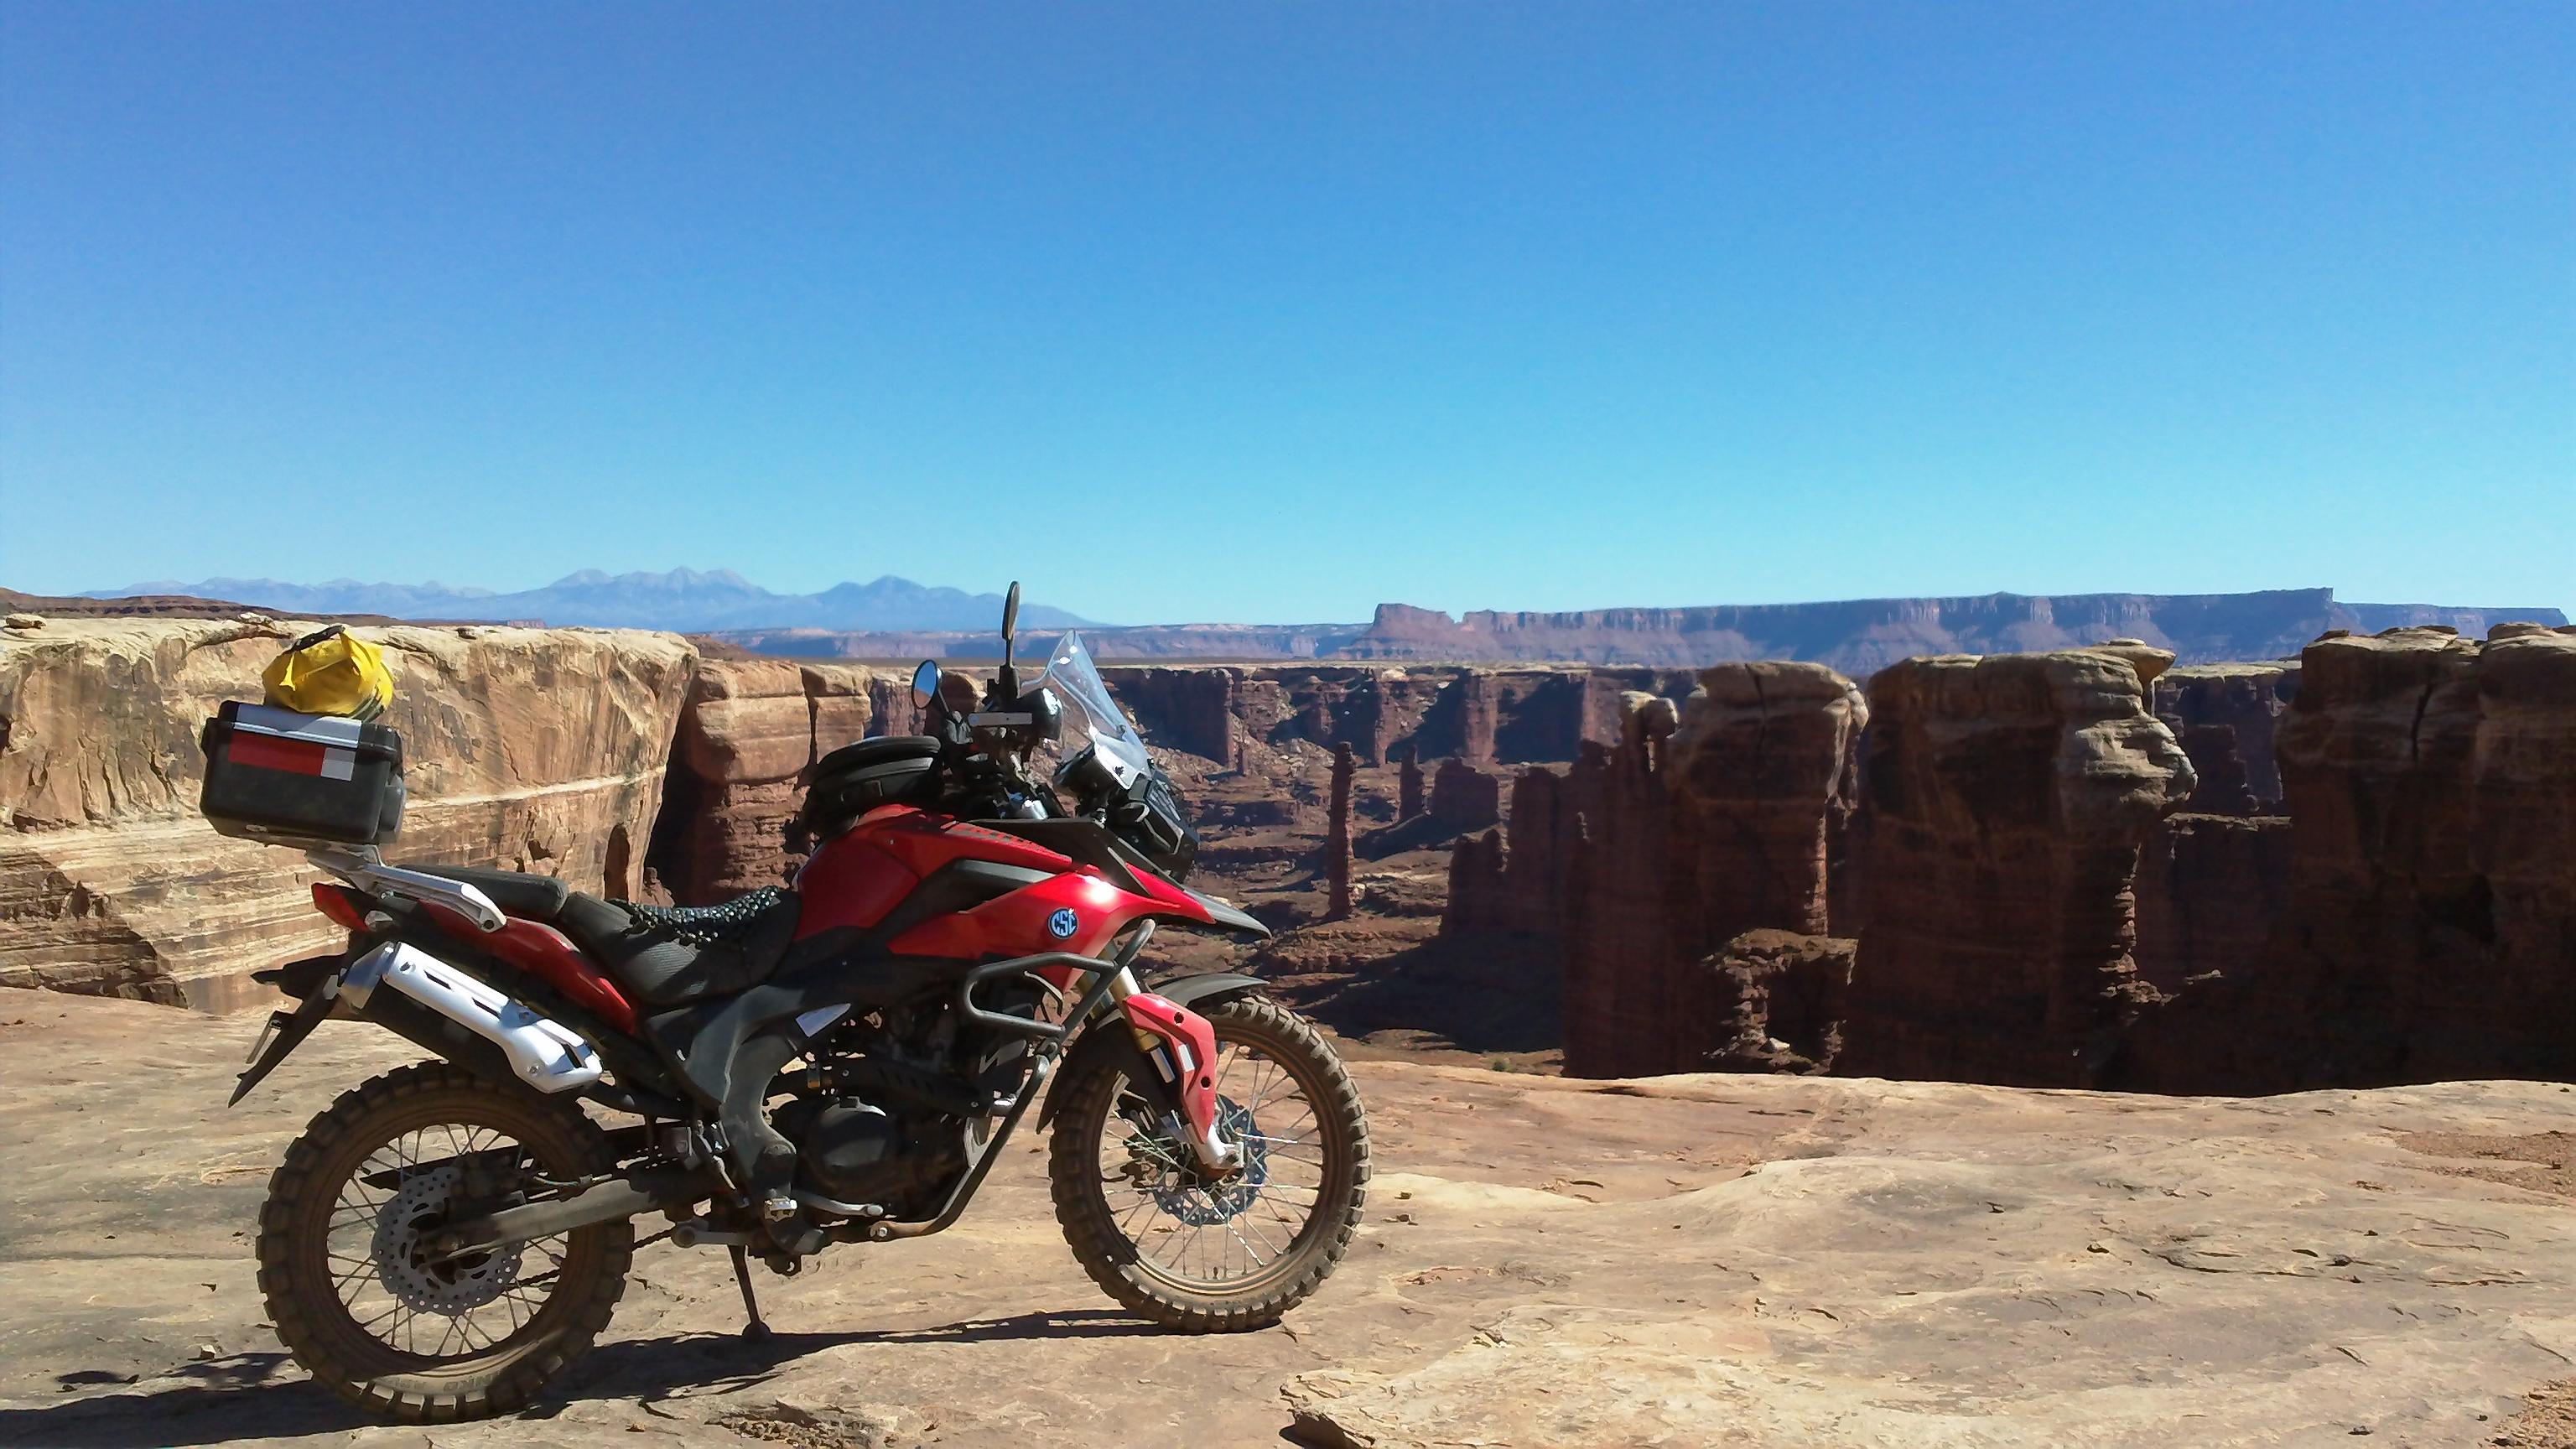 Why I Chose the CSC RX3 Adventure | CSC Blog